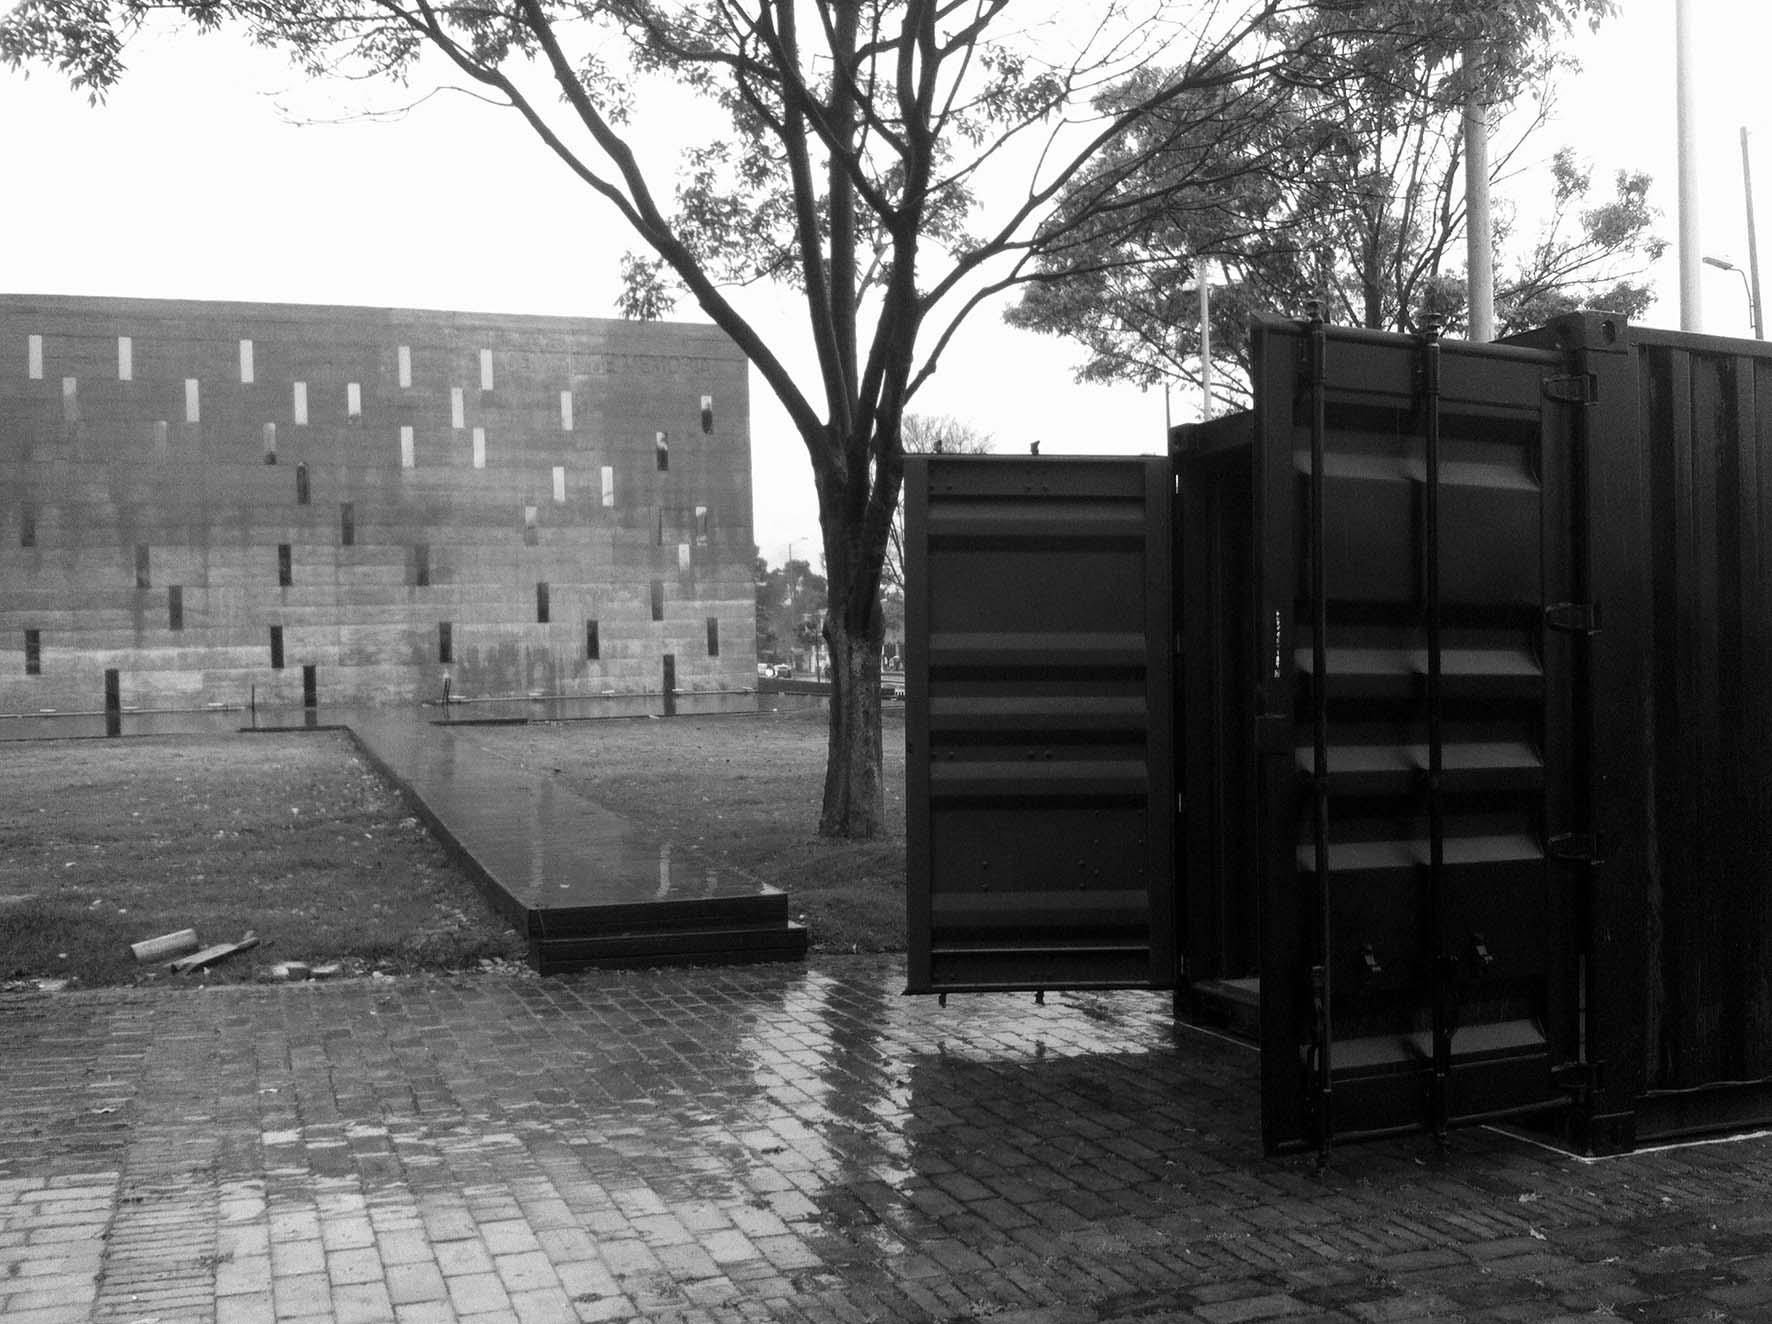 Caja Negra: Armero - Leonel Castañeda